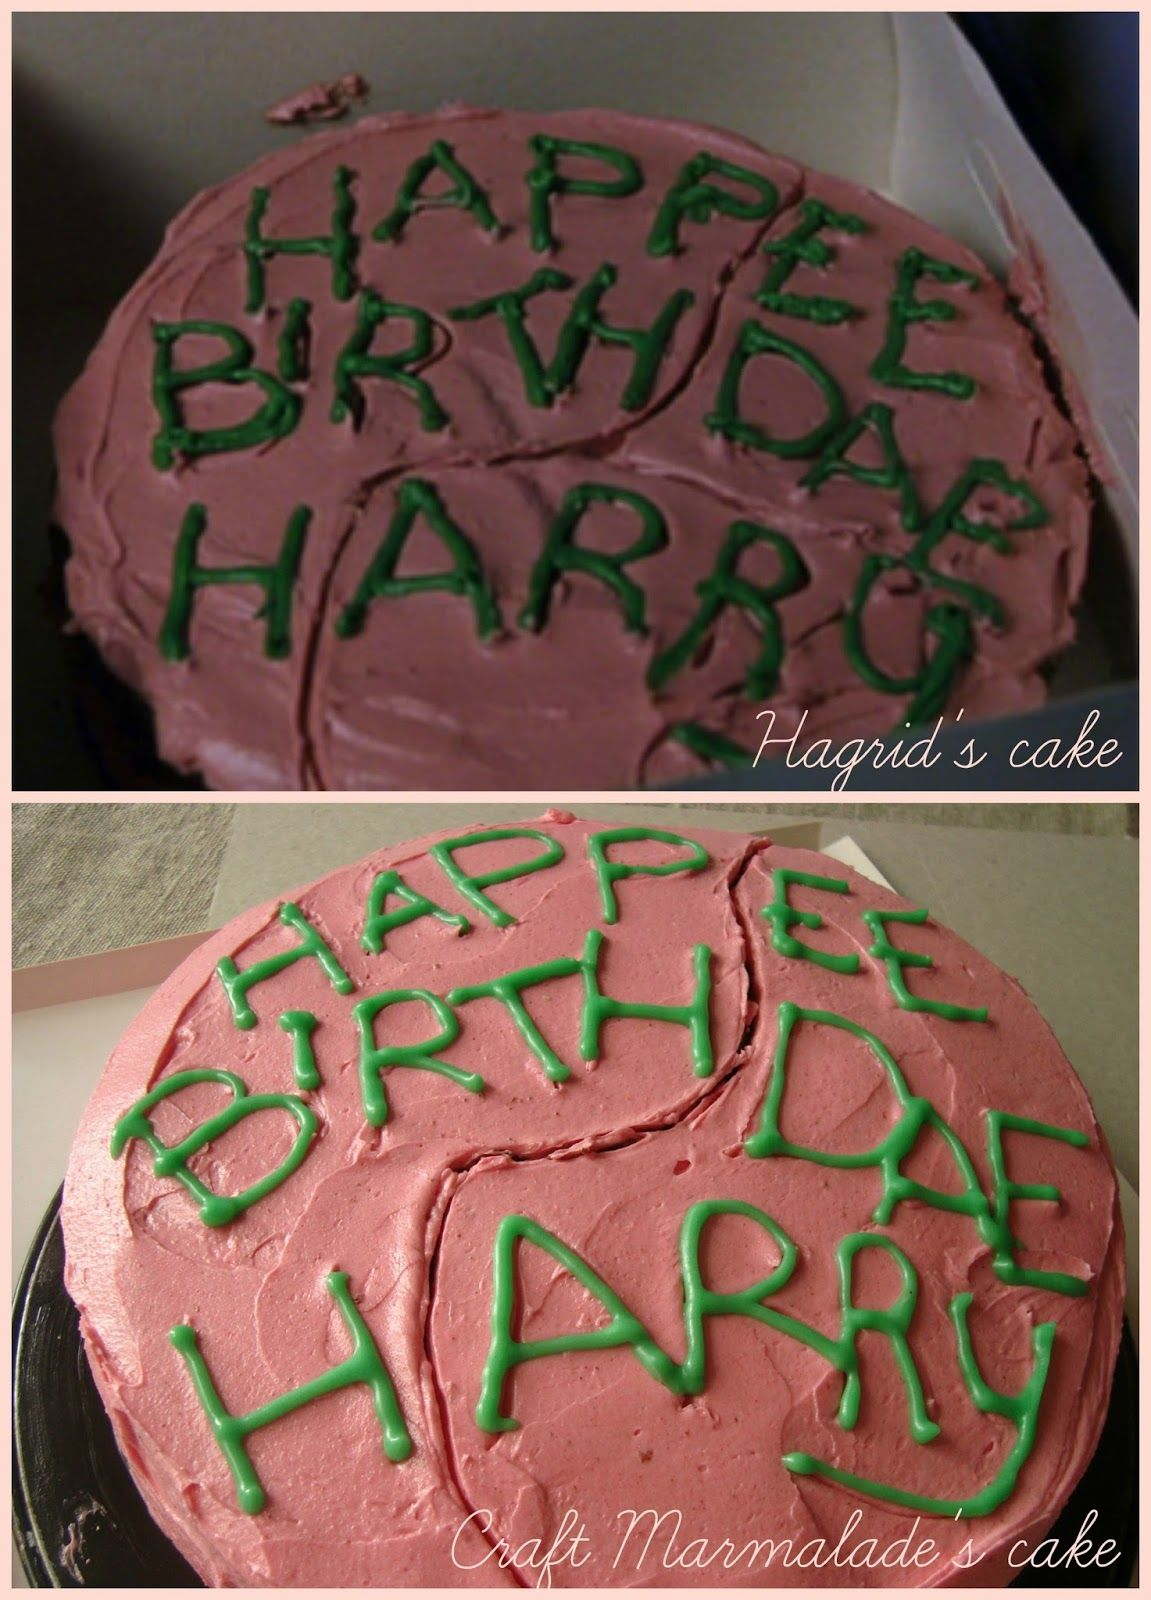 Craft Marmalade Harry Potter Birthday Cake Chocolate Layer Cake